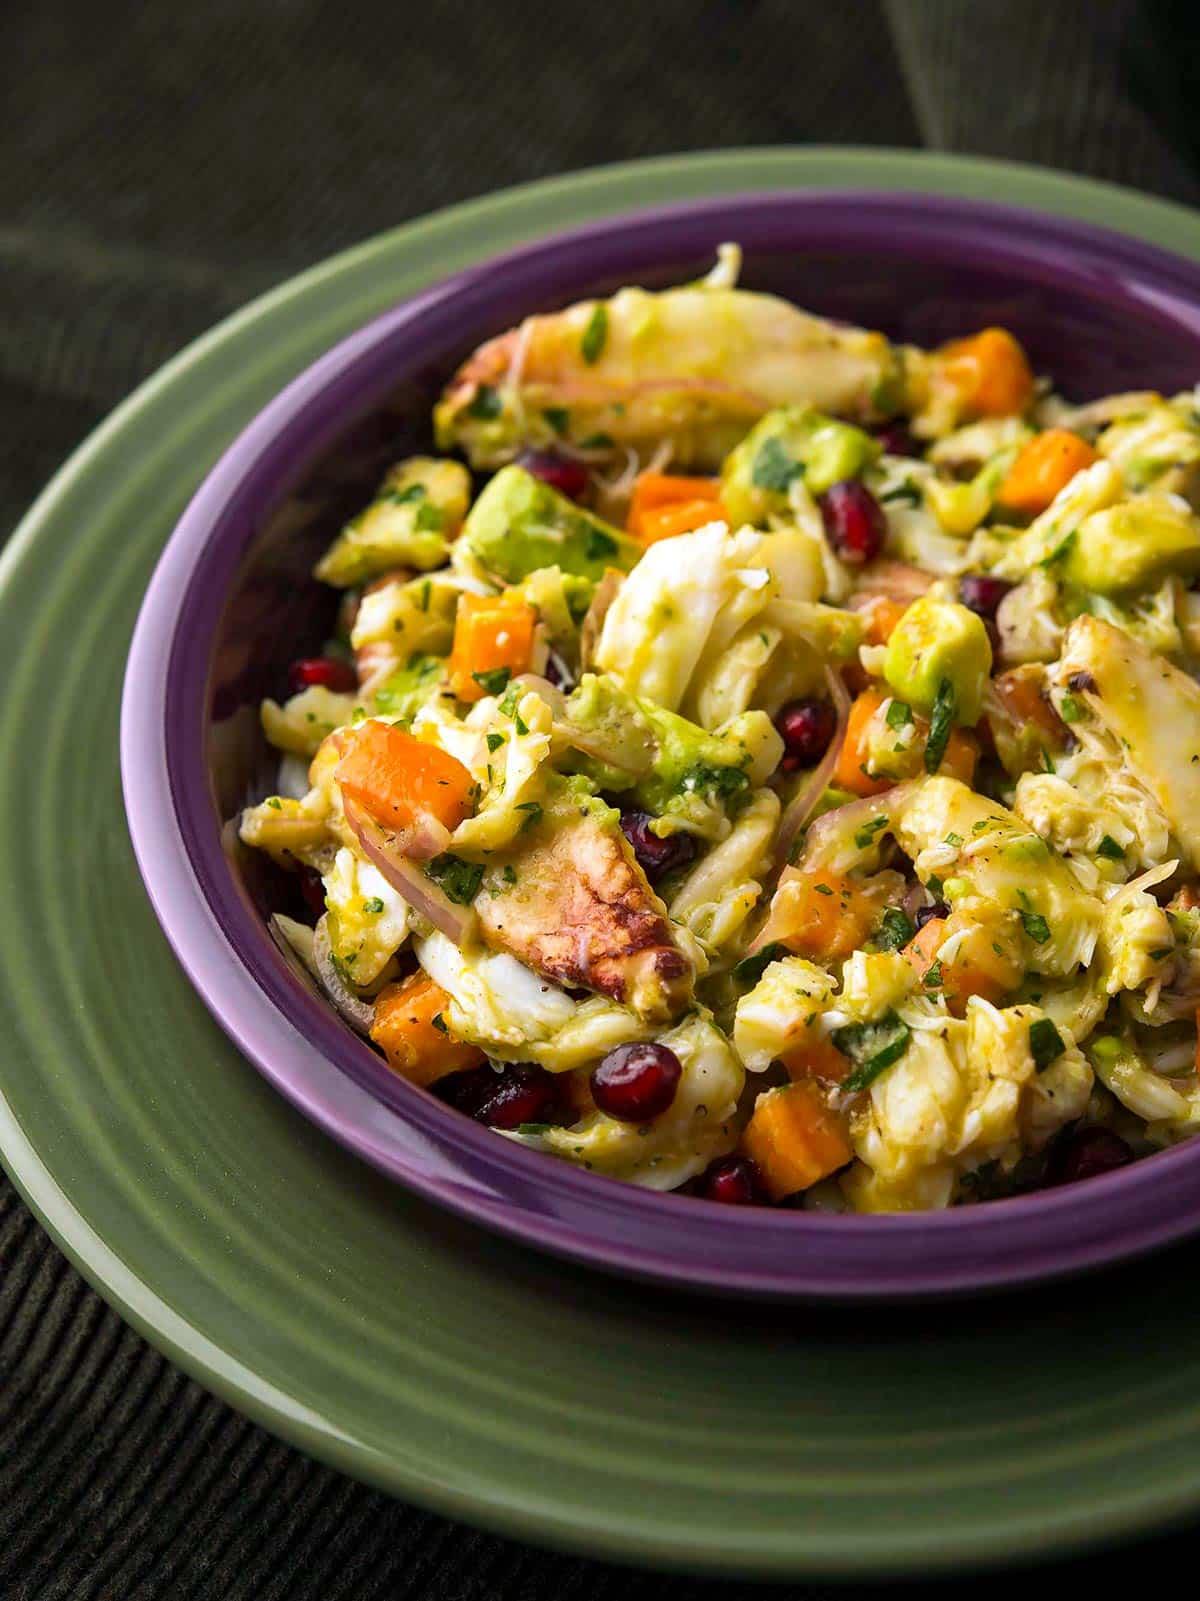 Closeup of a Dungeness crab salad